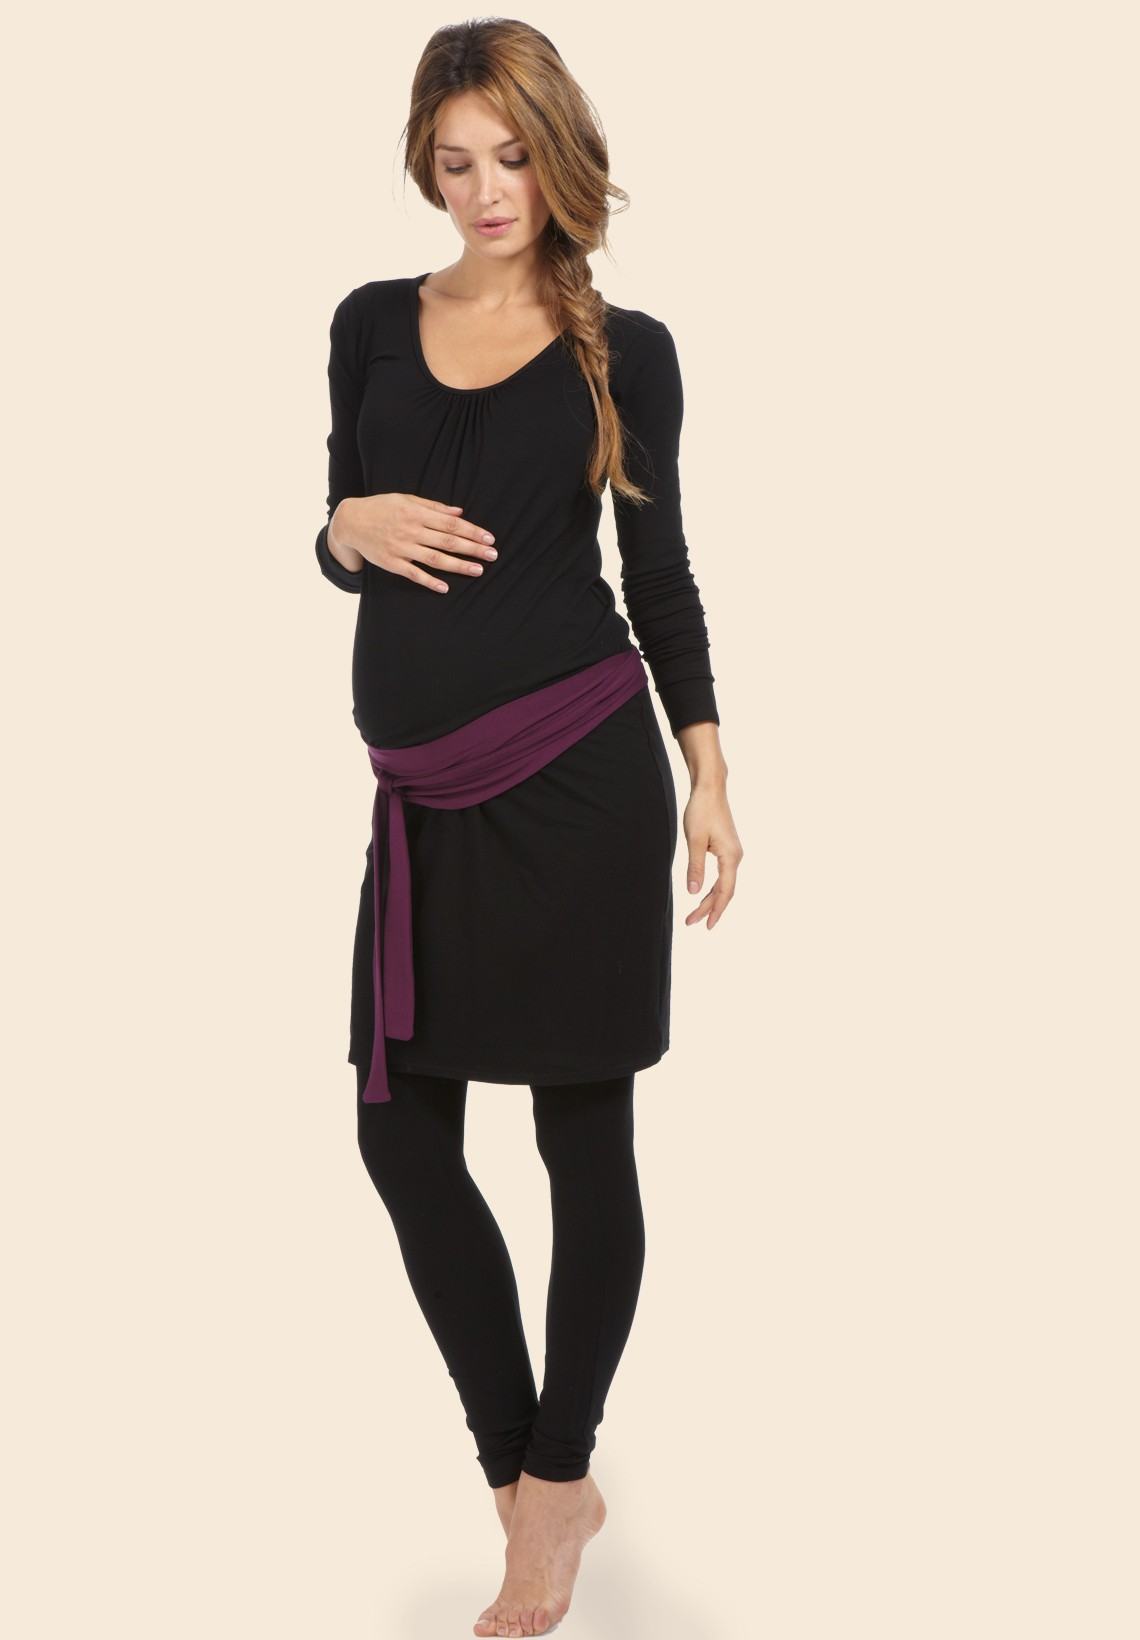 Vêtement de grossesse